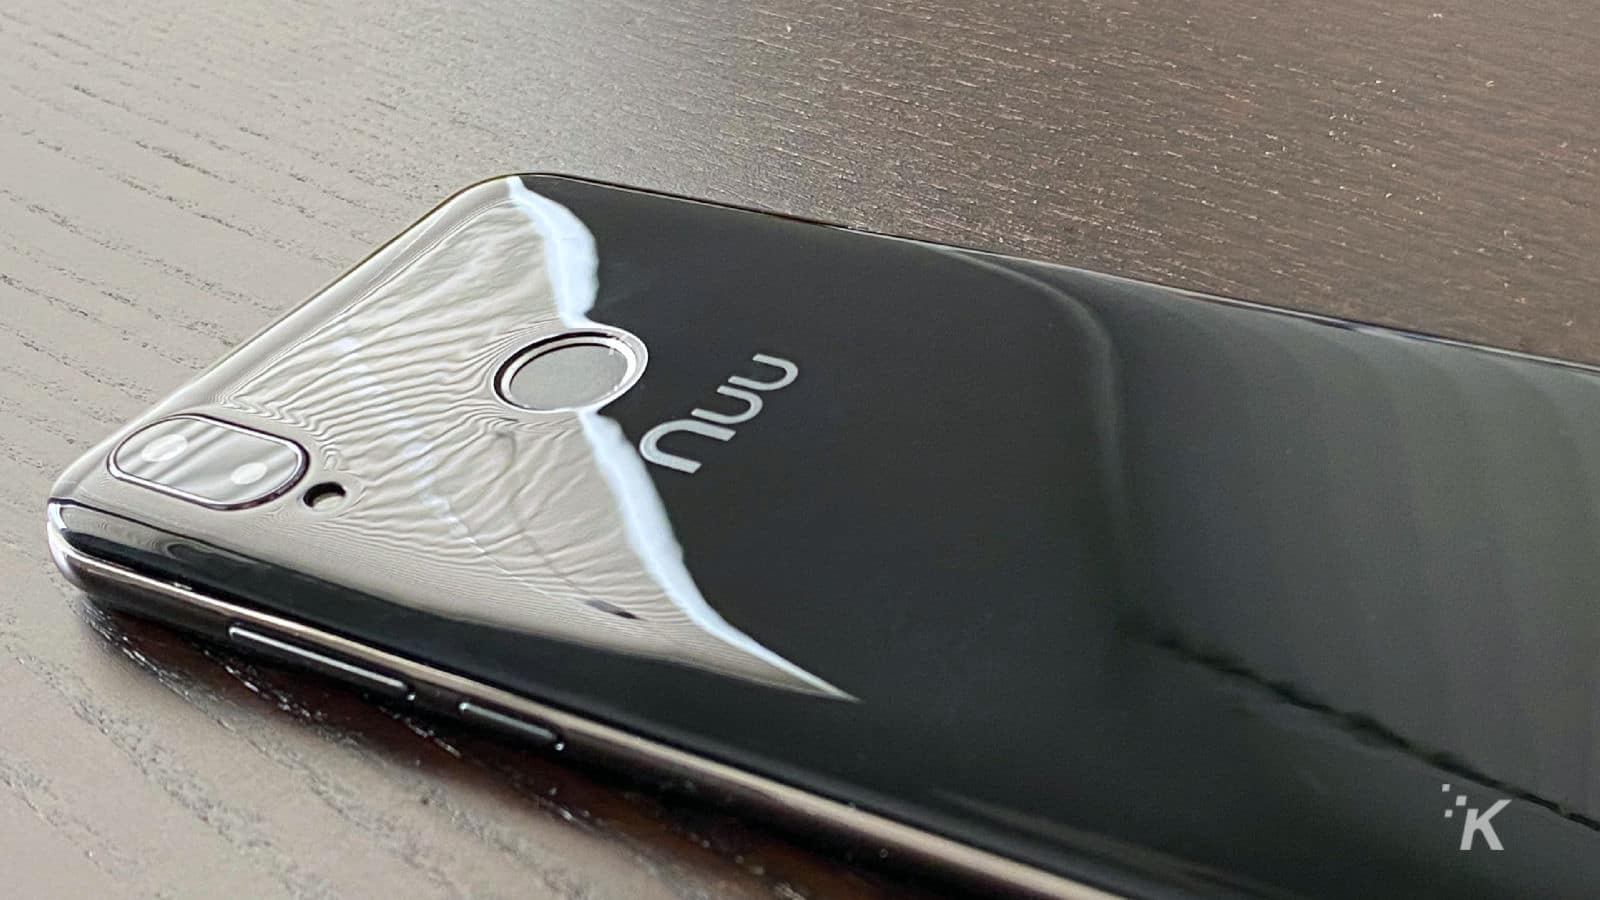 nuu mobile x6 phone